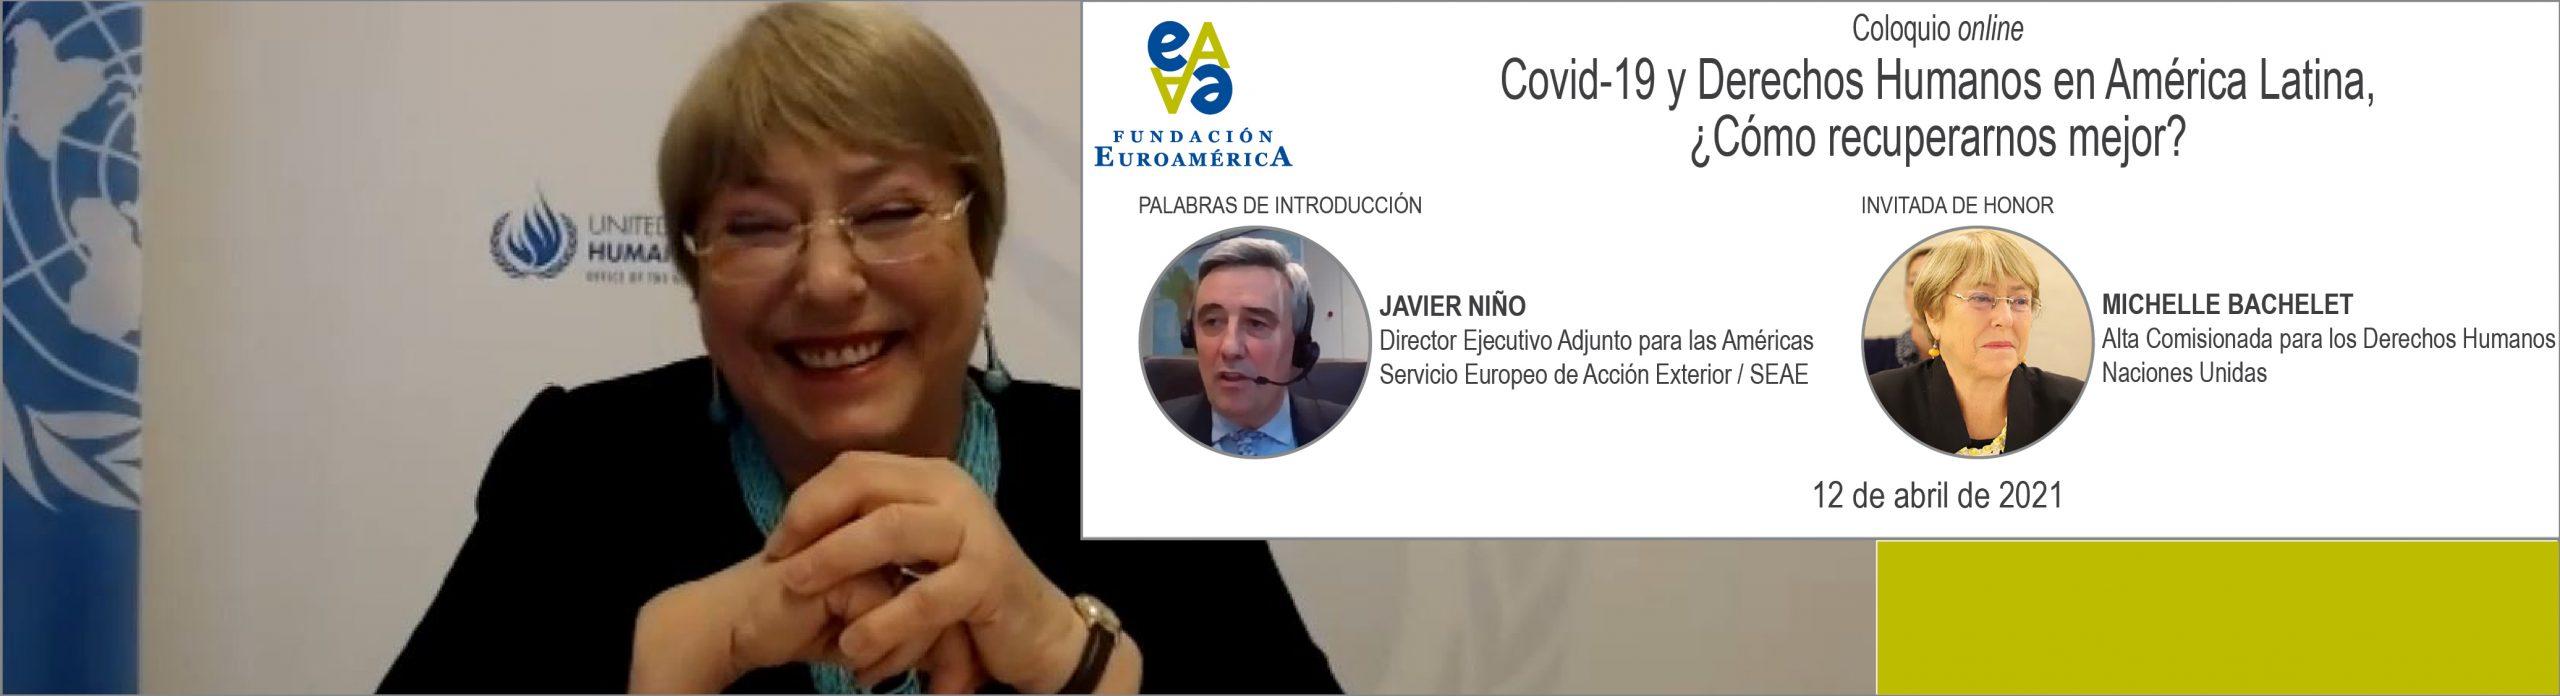 Online / Michelle Bachelet, Alta Comisionada